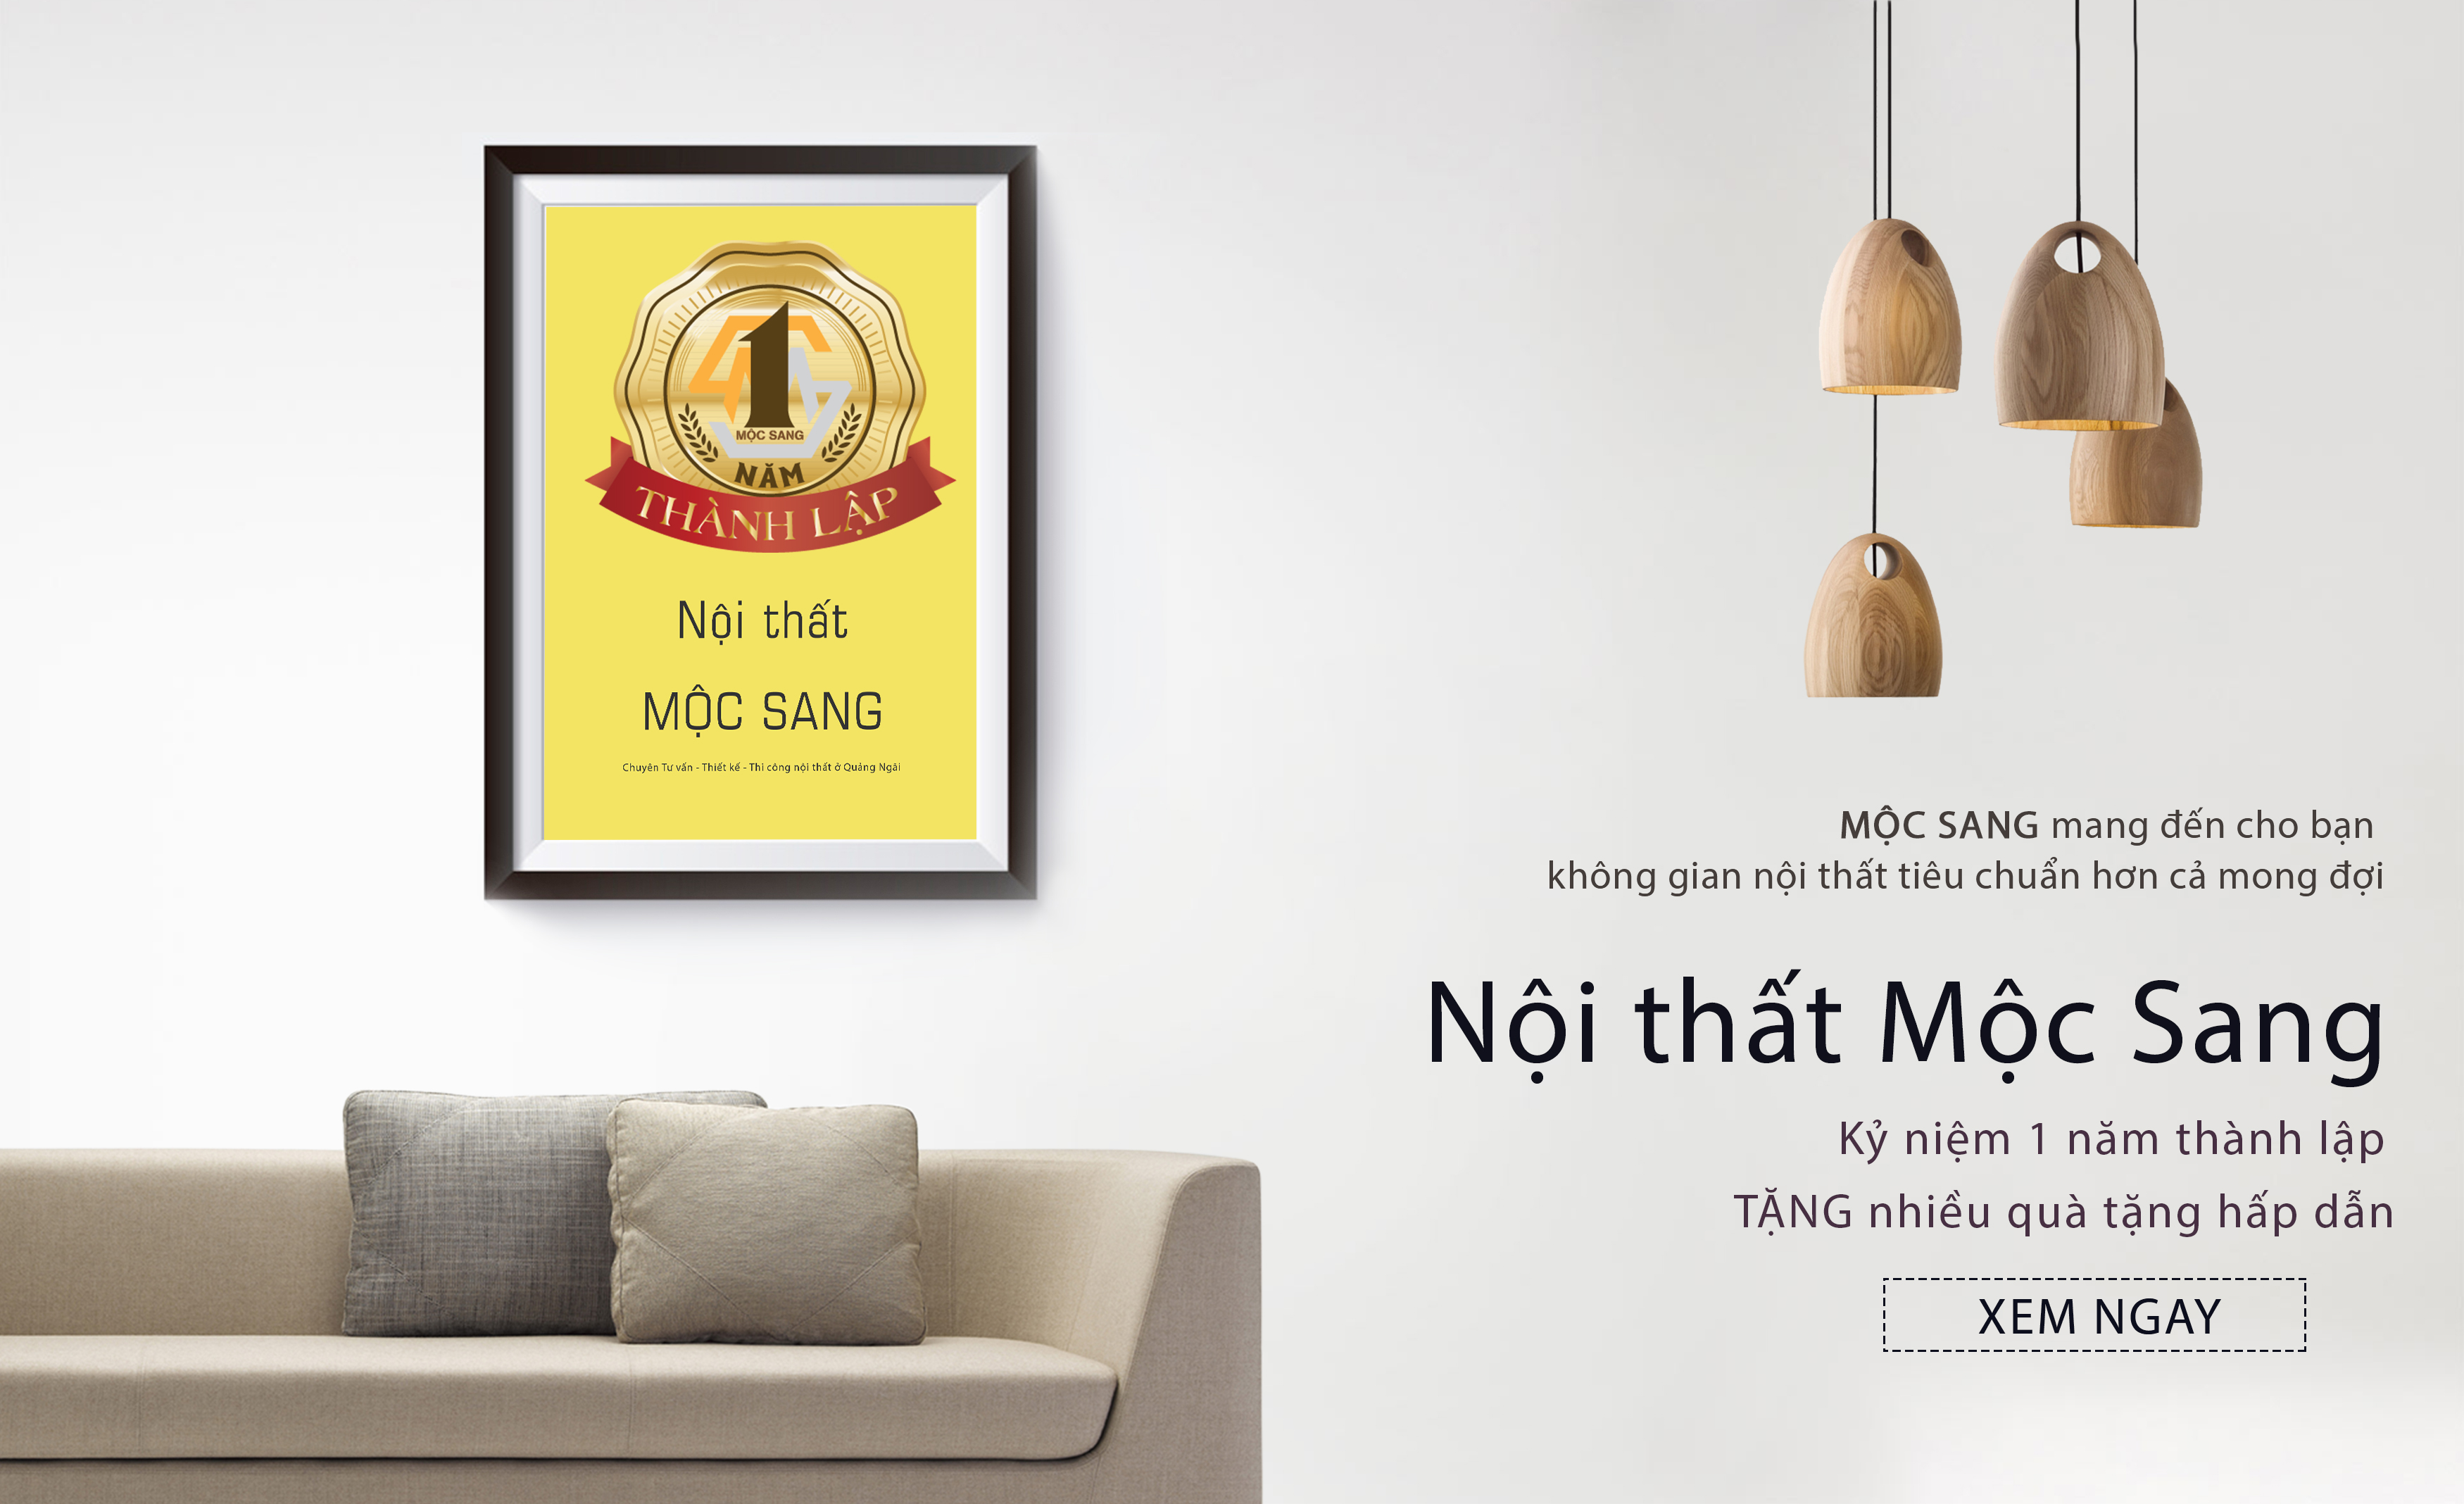 noi-that-quang-ngai-moc-sang-tri-khach-hang-nhan-ky-niem-1-nam-thanh-lap-2